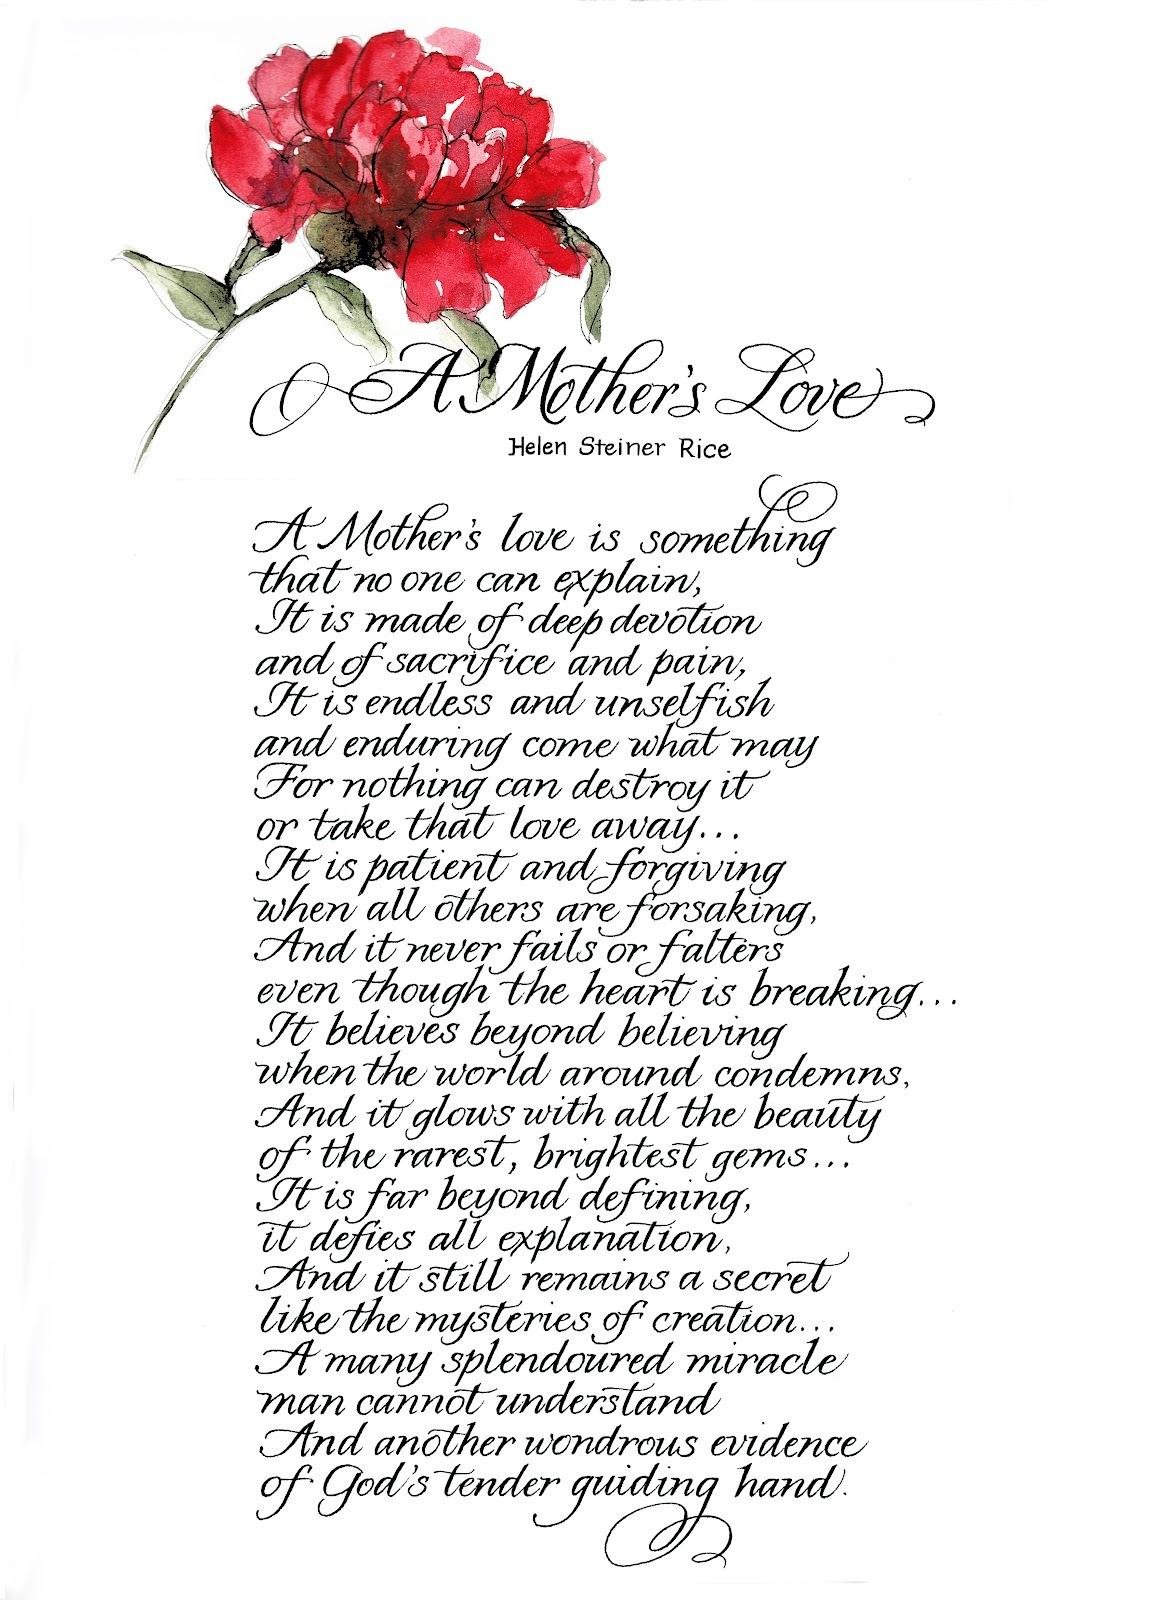 Go Bee Happy Poems by Helen Steiner Rice